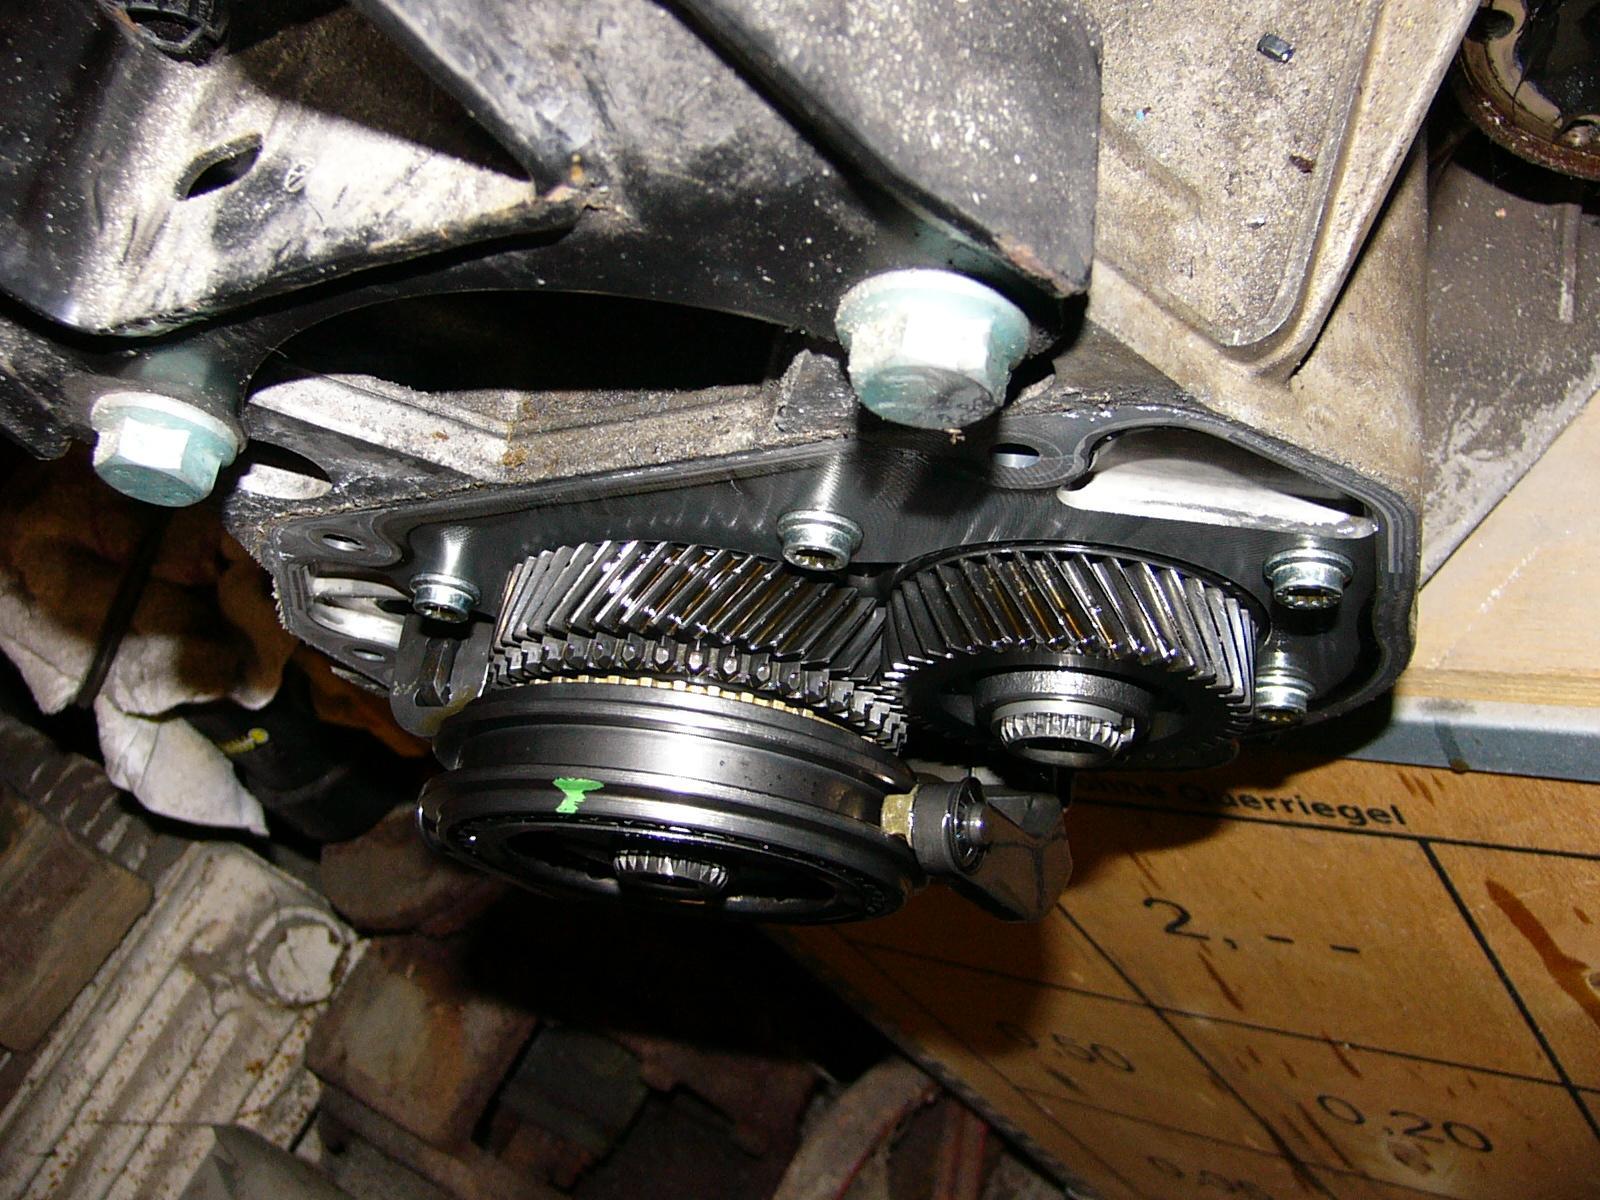 58933eab66dcd_14B-Getriebe-1.JPG.80dbb434a5b4a3c10a63ee4a3665514b.JPG